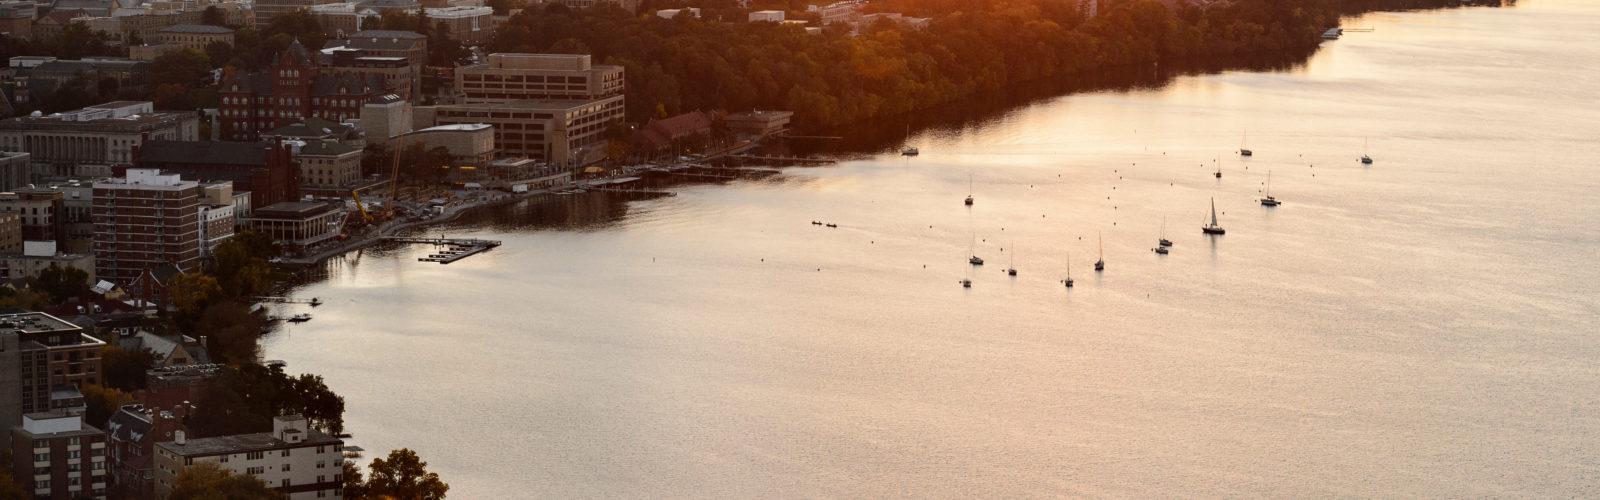 Aerial shot of Madison at sunset